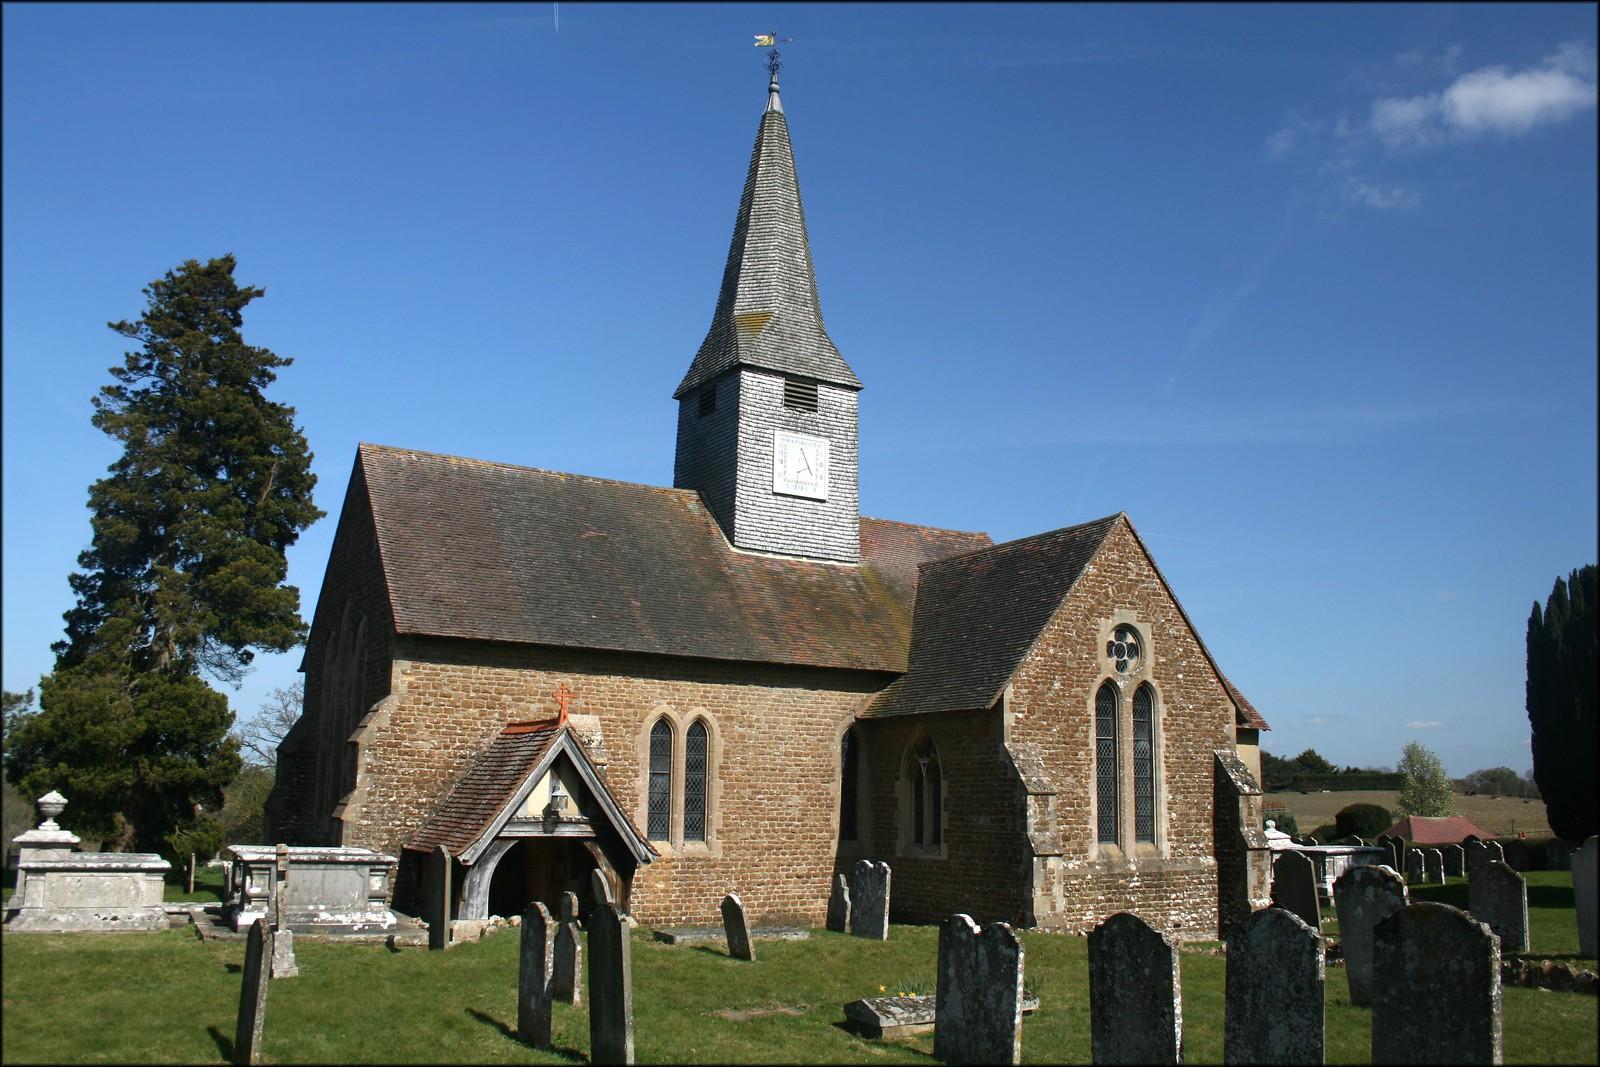 St Michael and All Angels church, Thursley